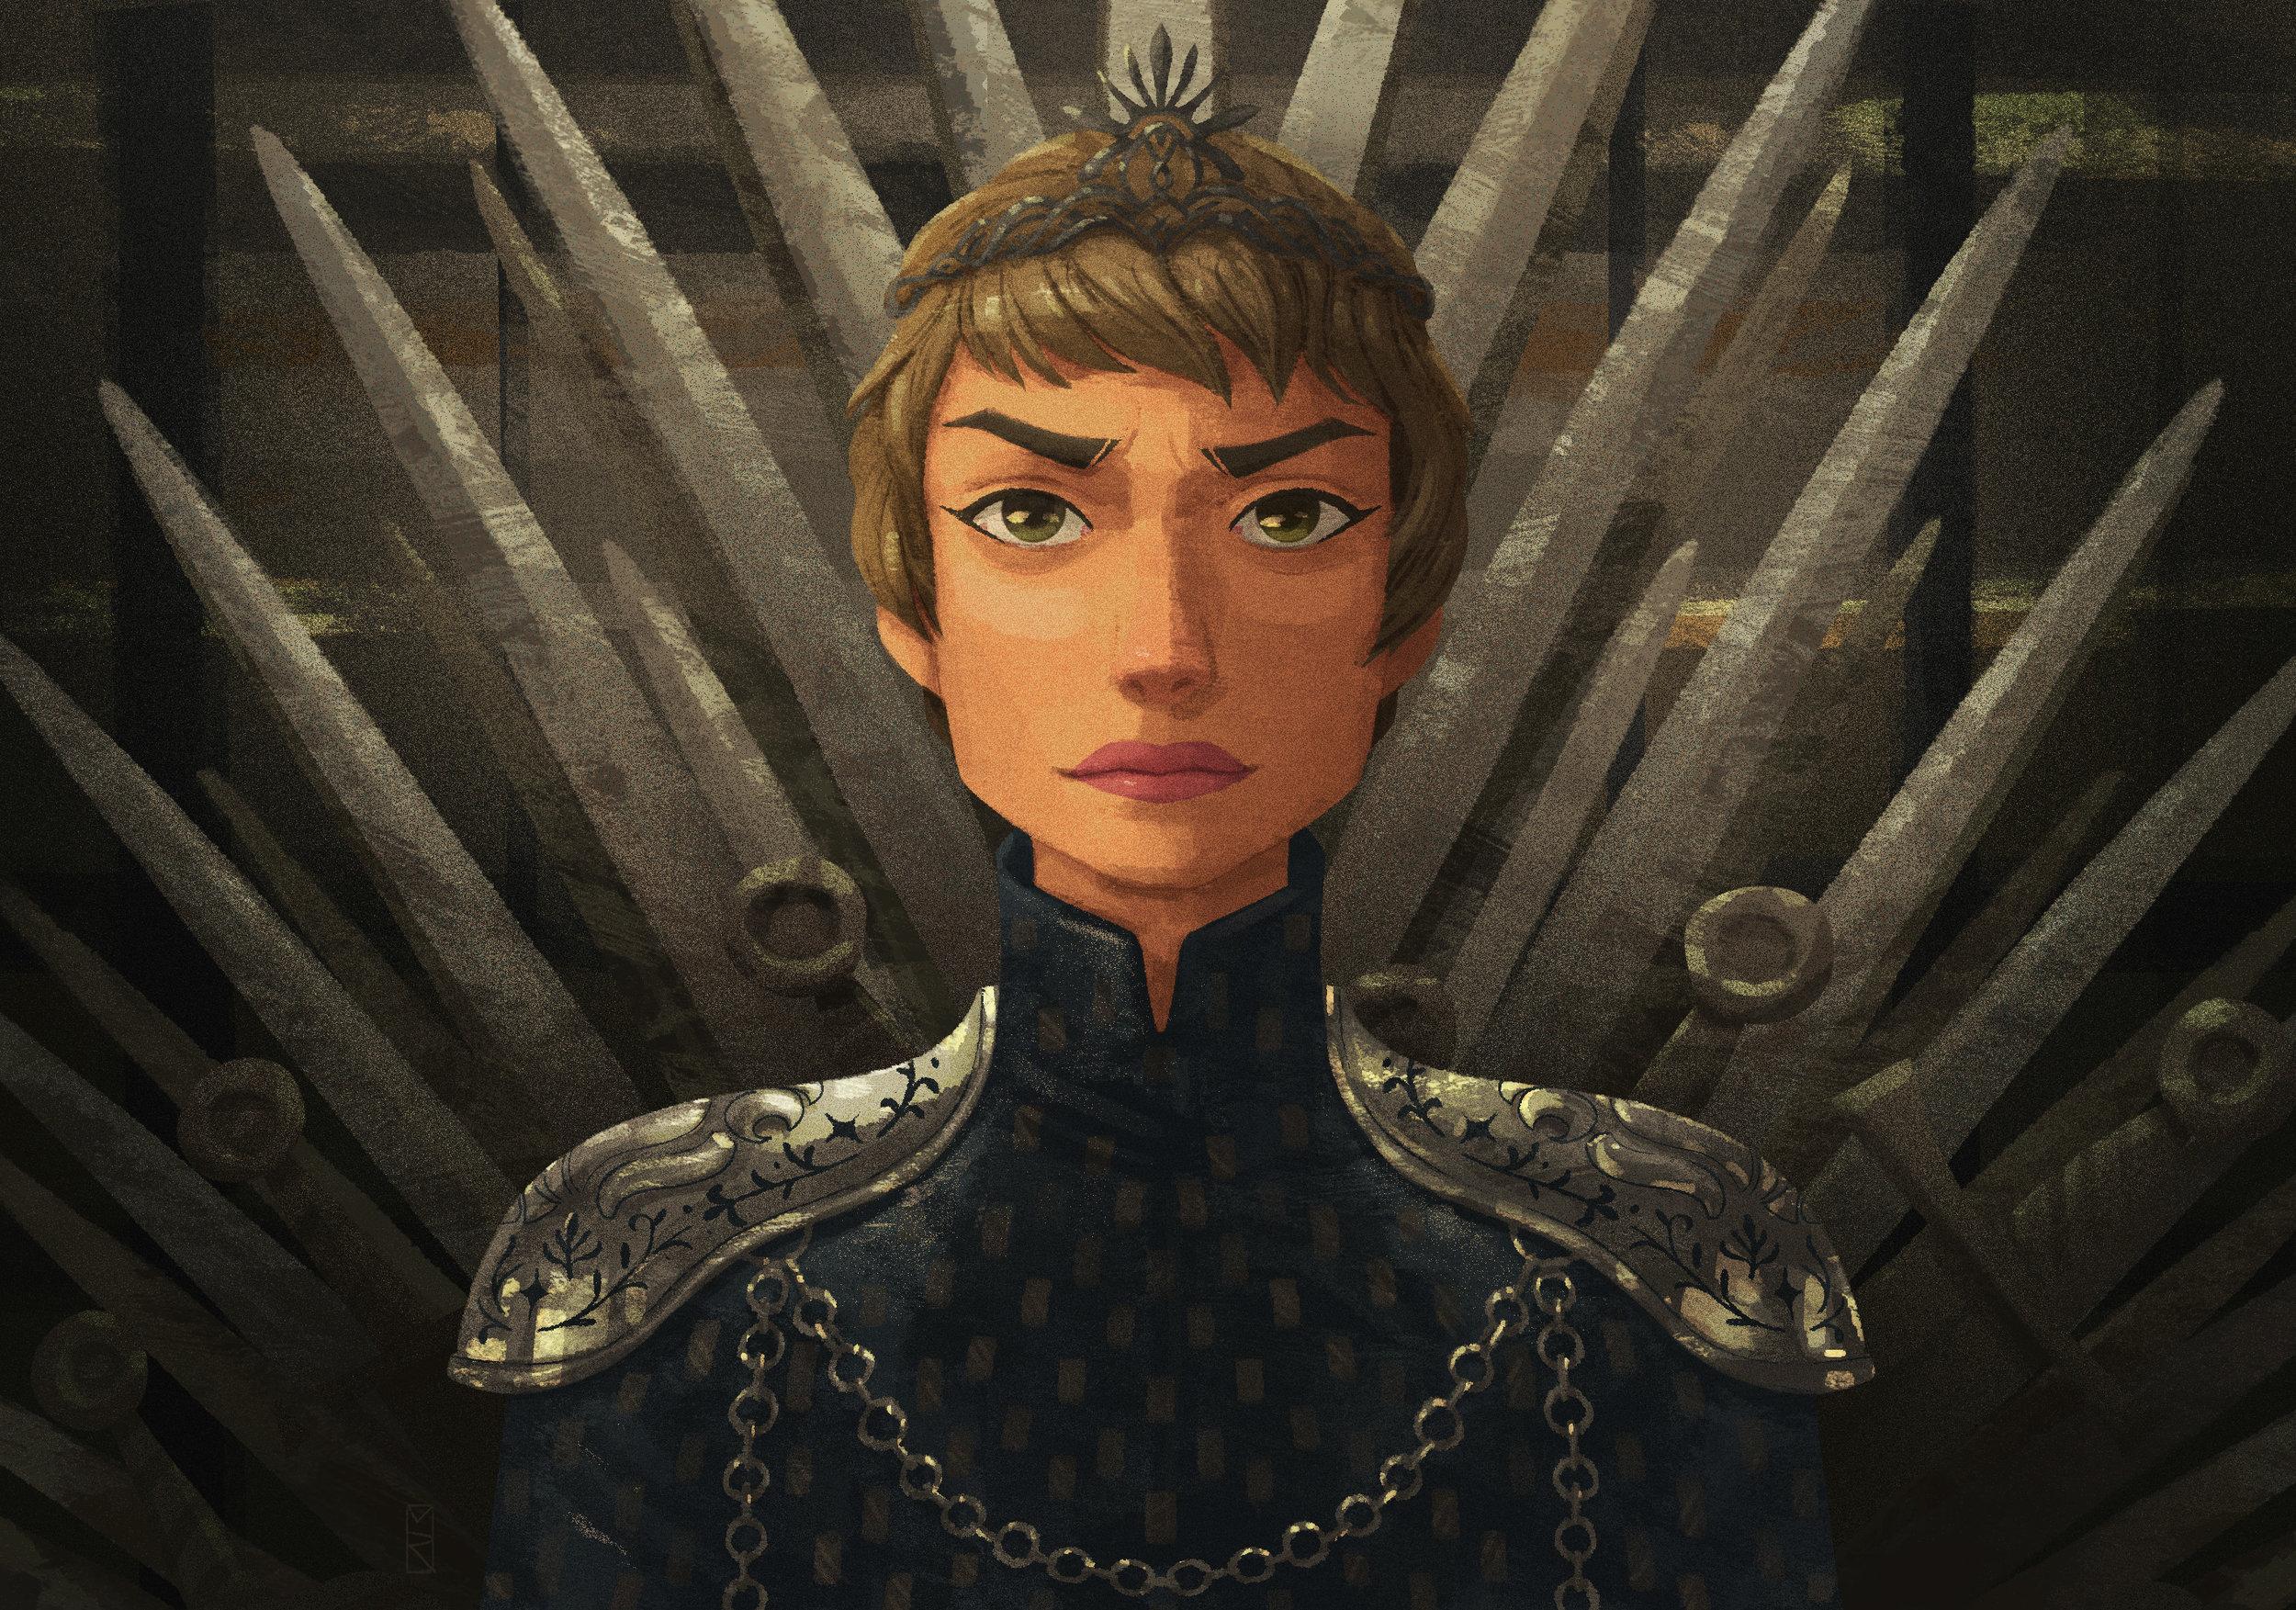 51_Cersei.jpg